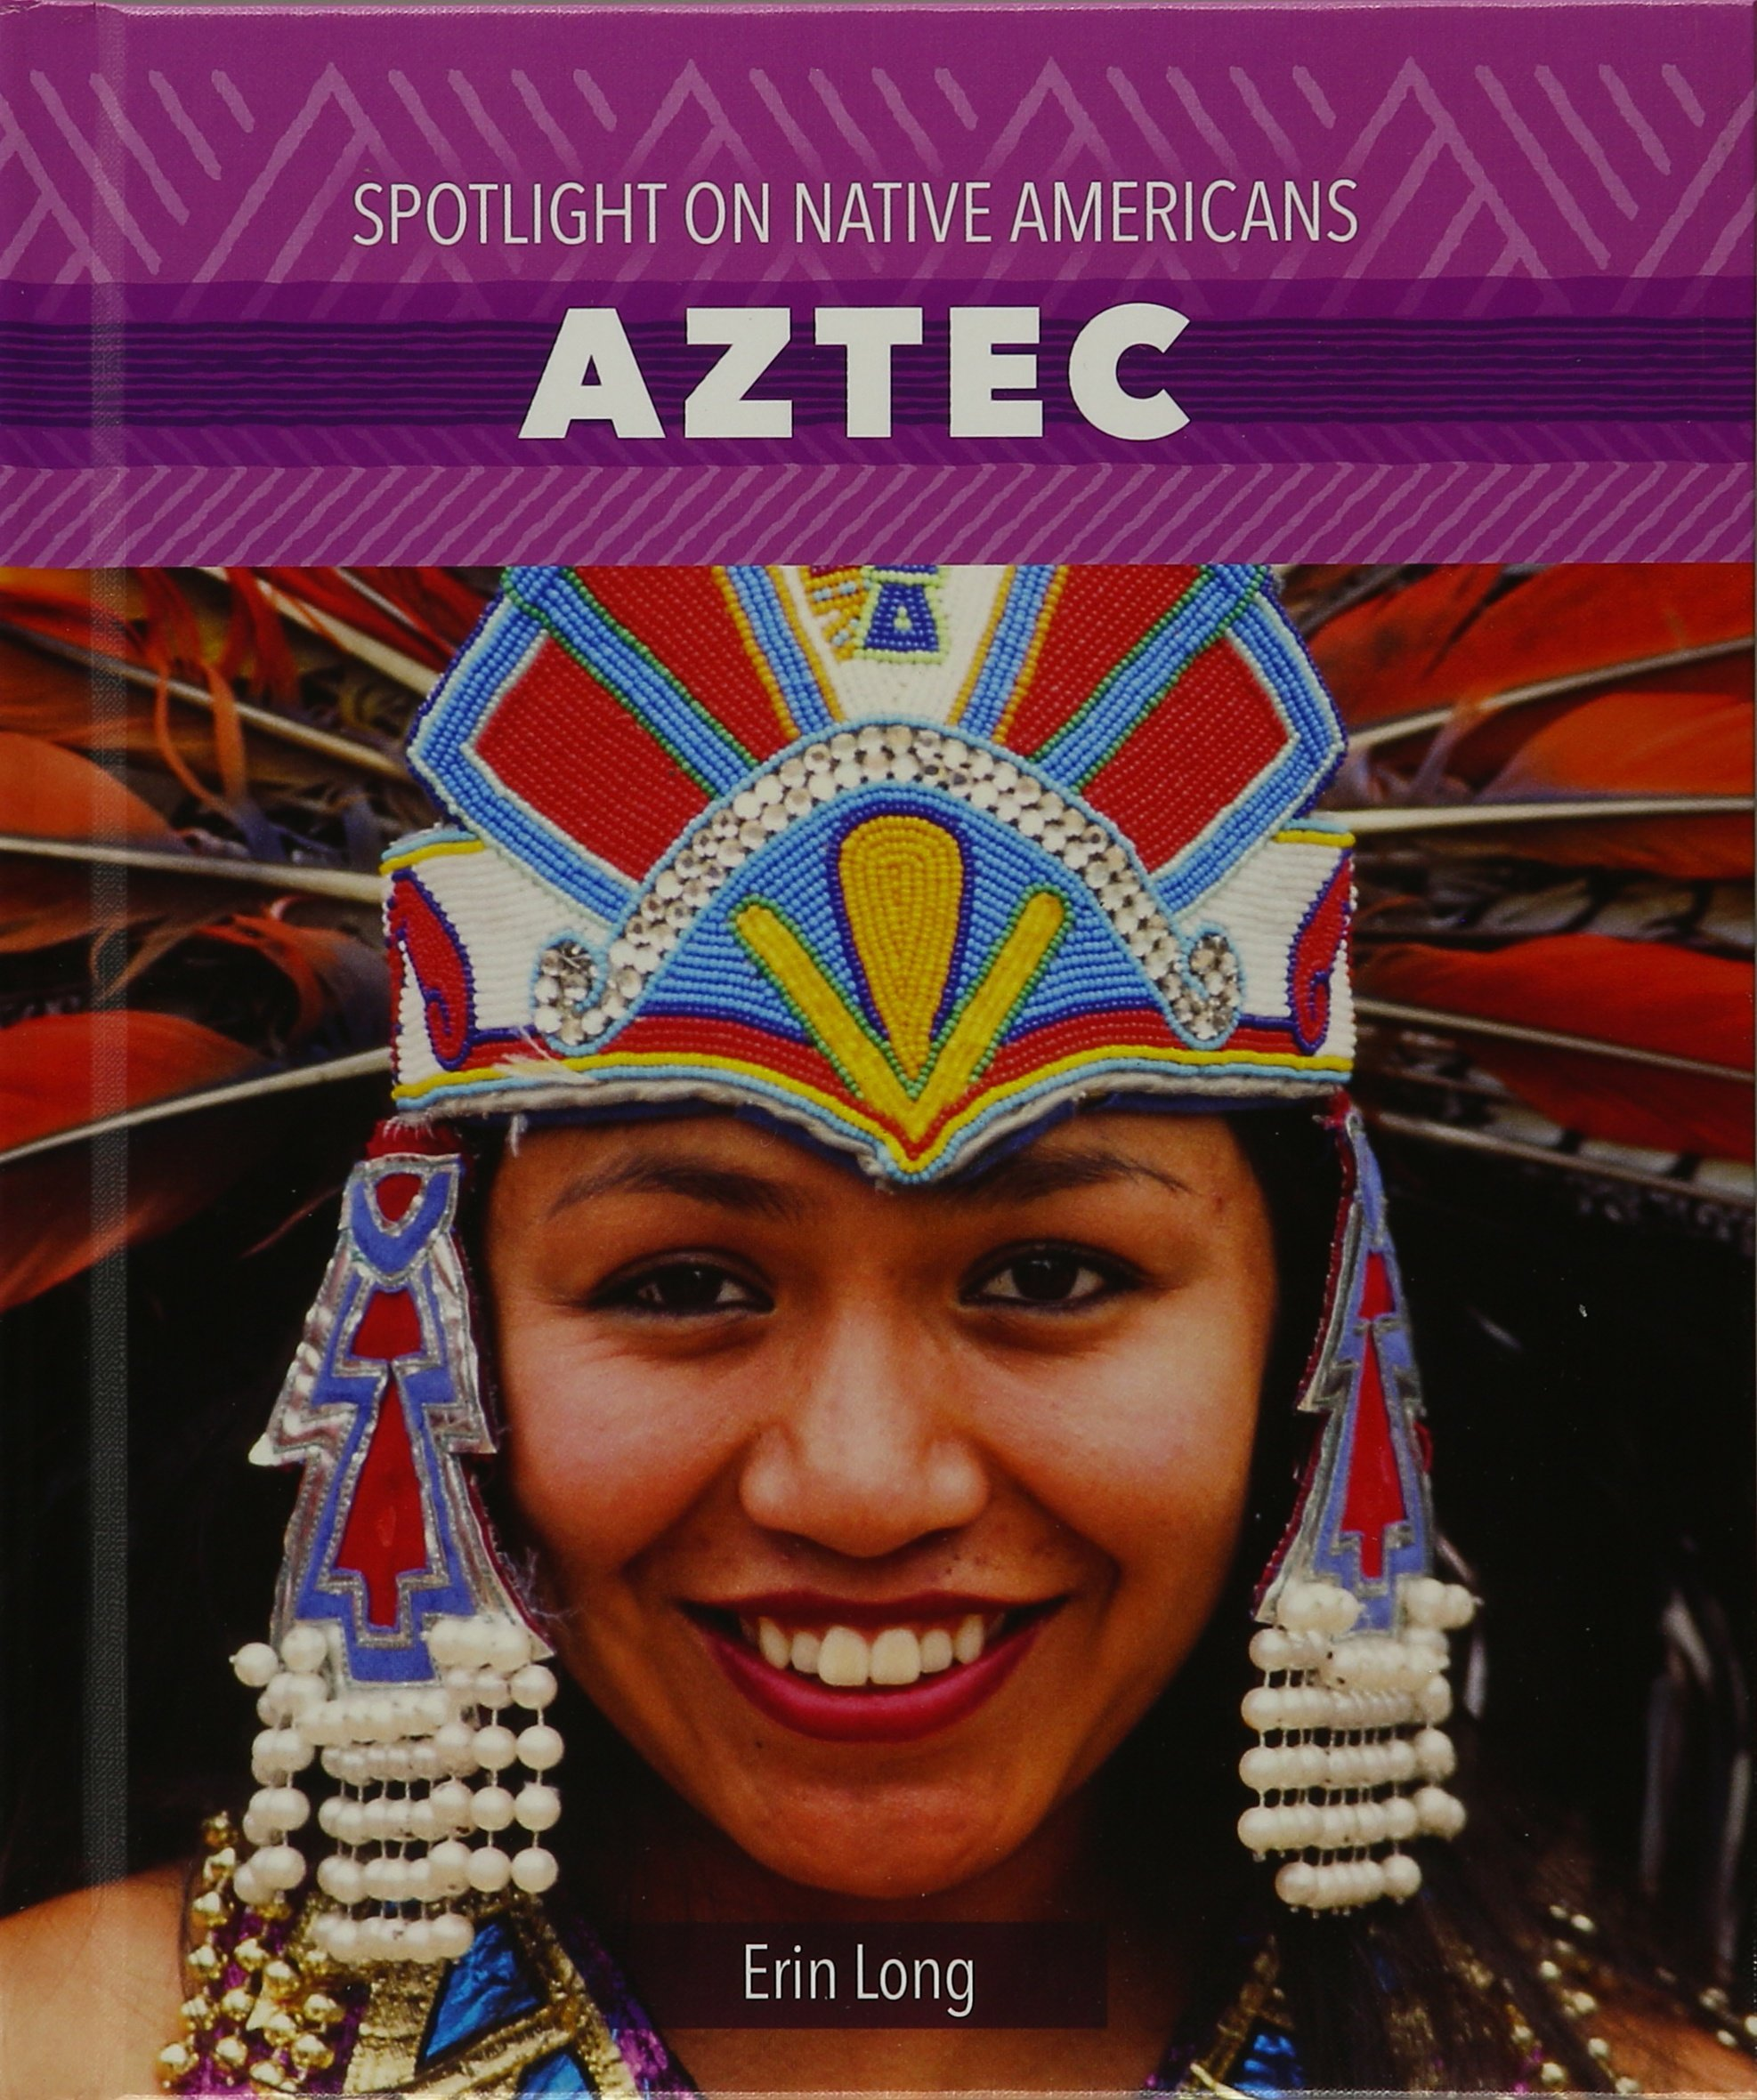 Aztec (Spotlight on Native Americans)